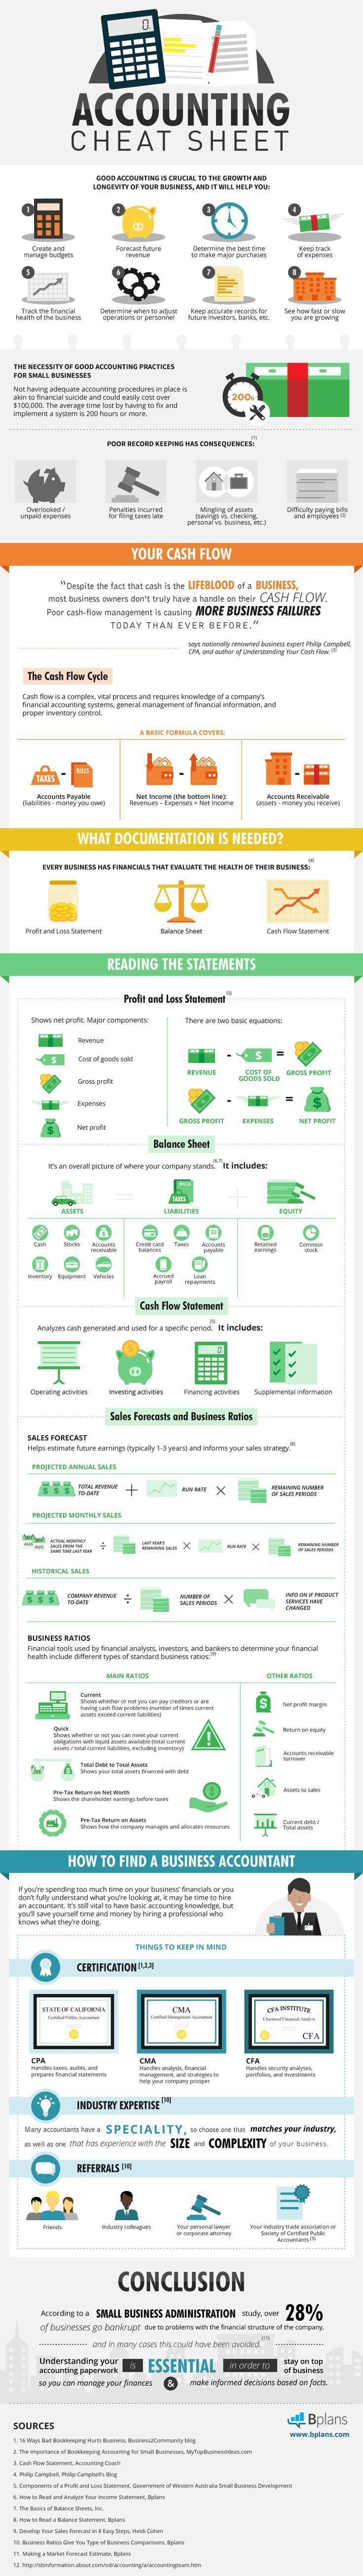 Accounting-Basics-Cheat-Sheet.